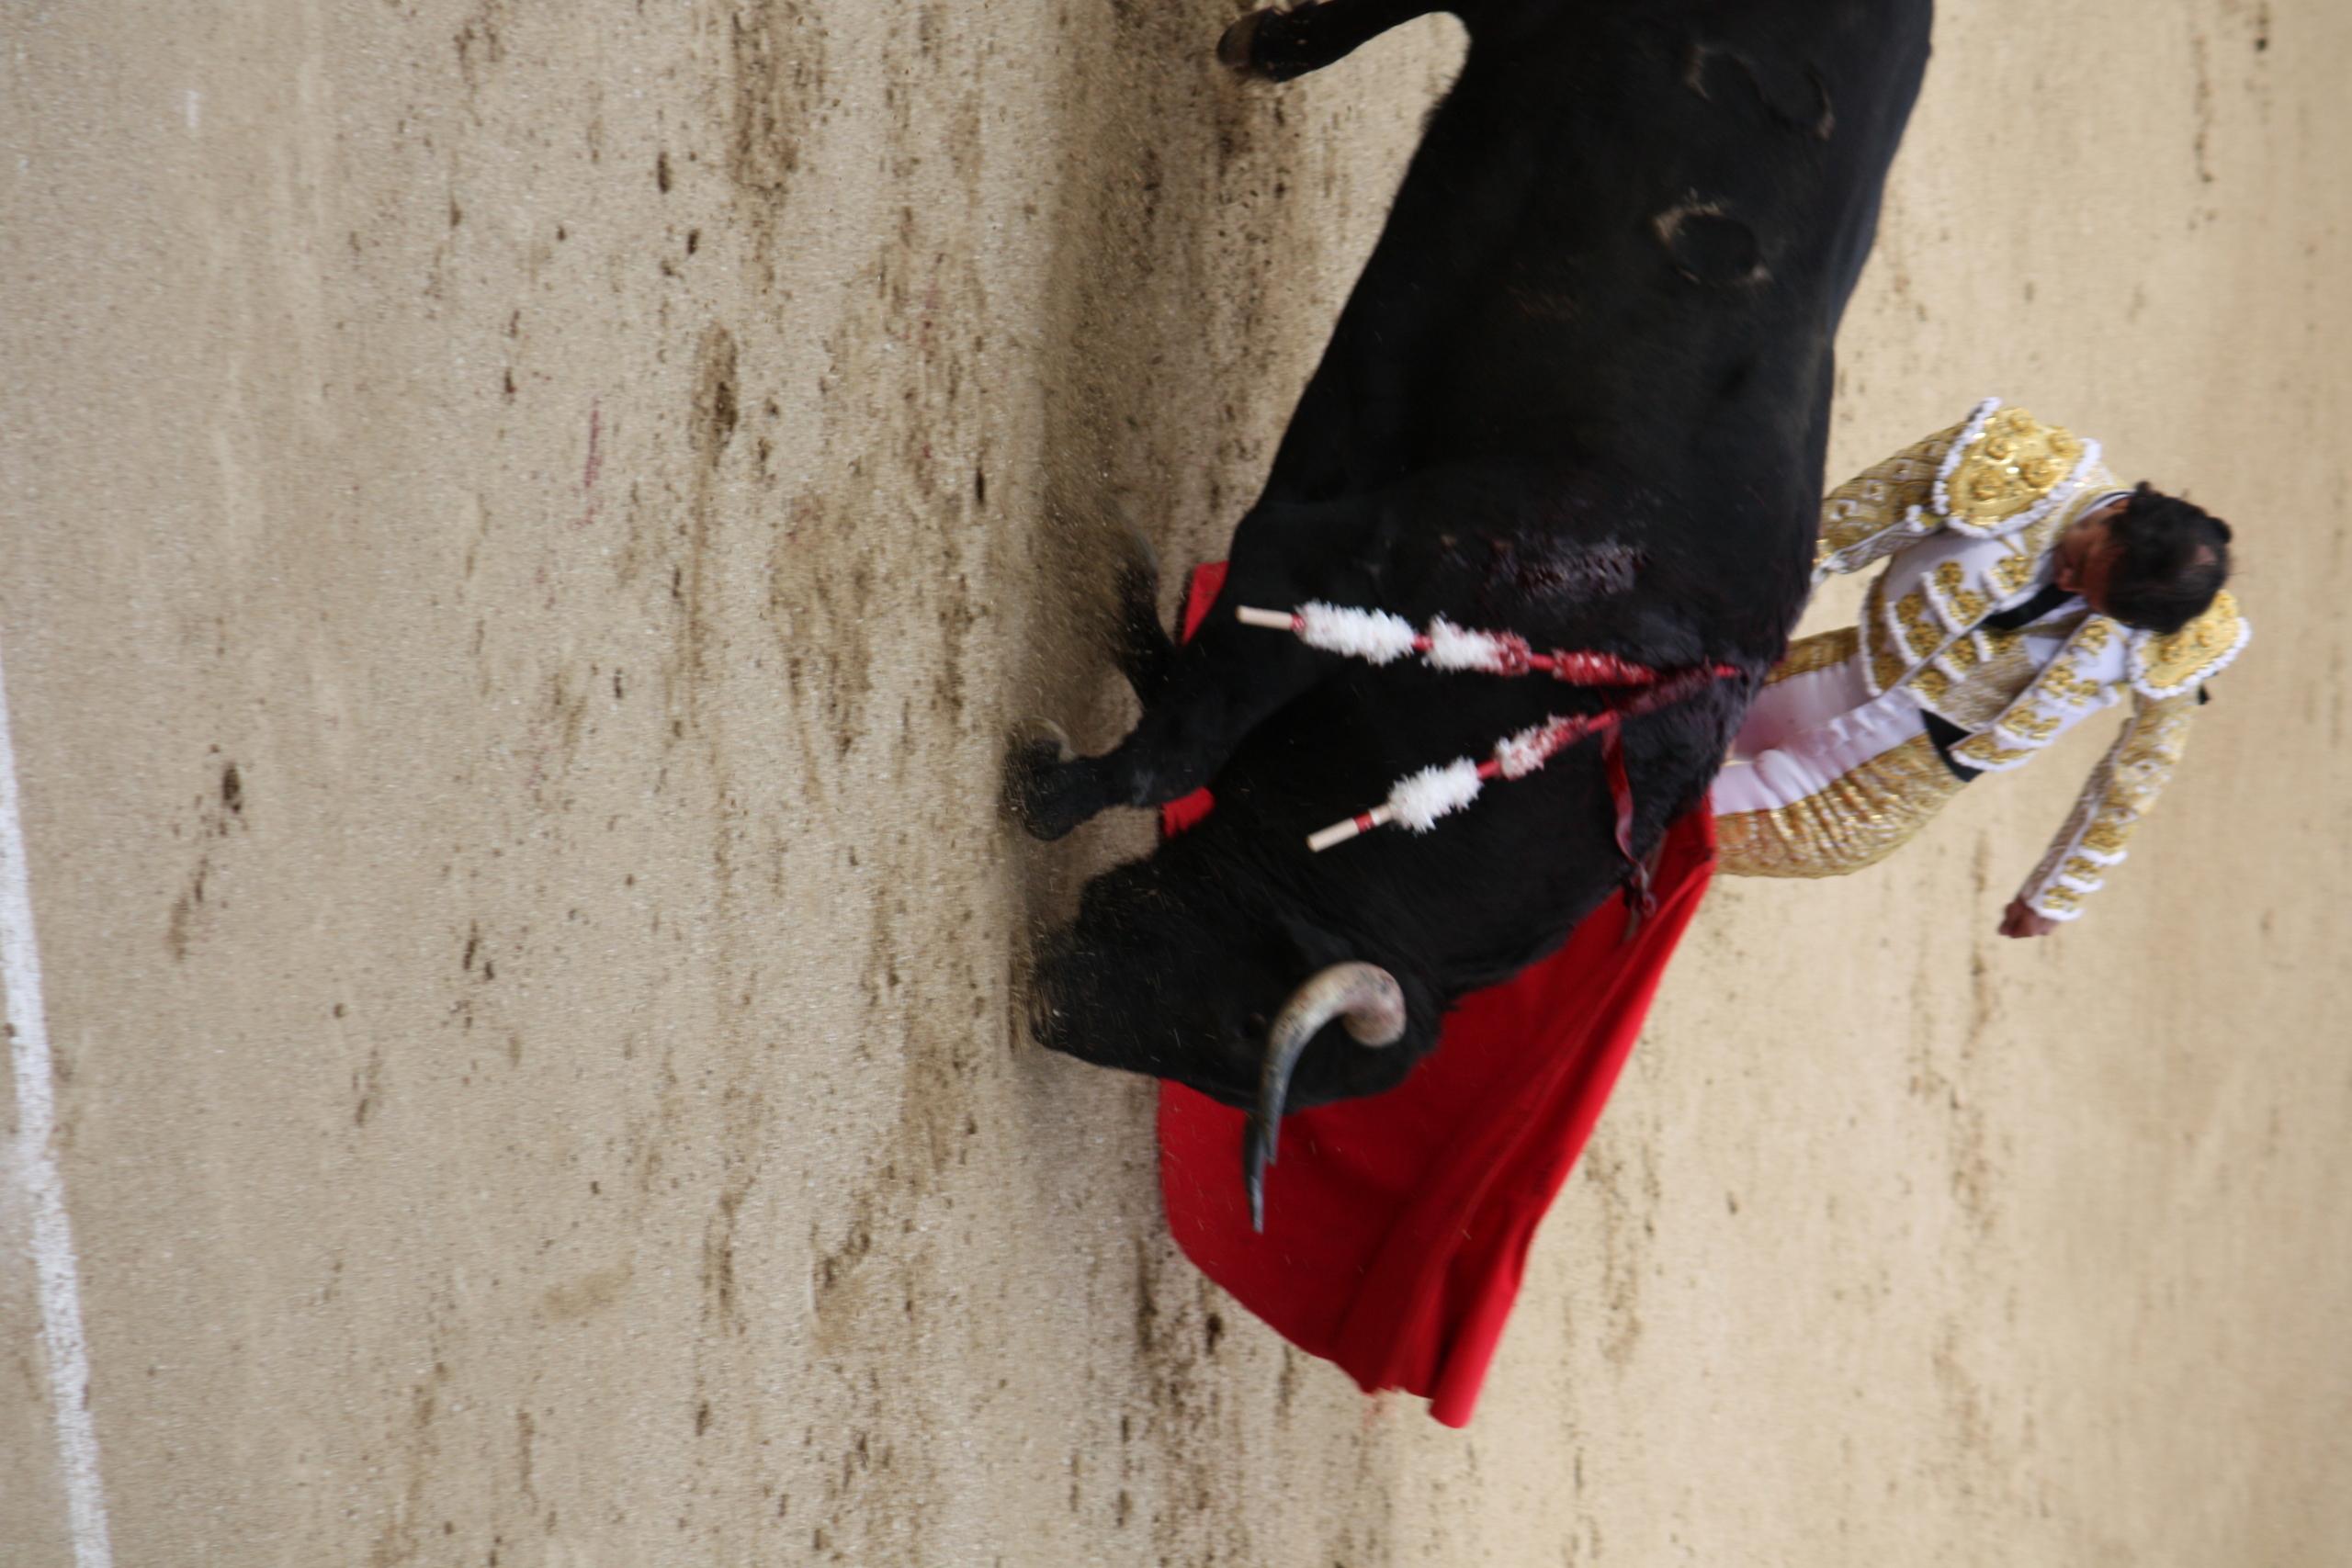 bull fighting 1920x1080 hd - photo #31